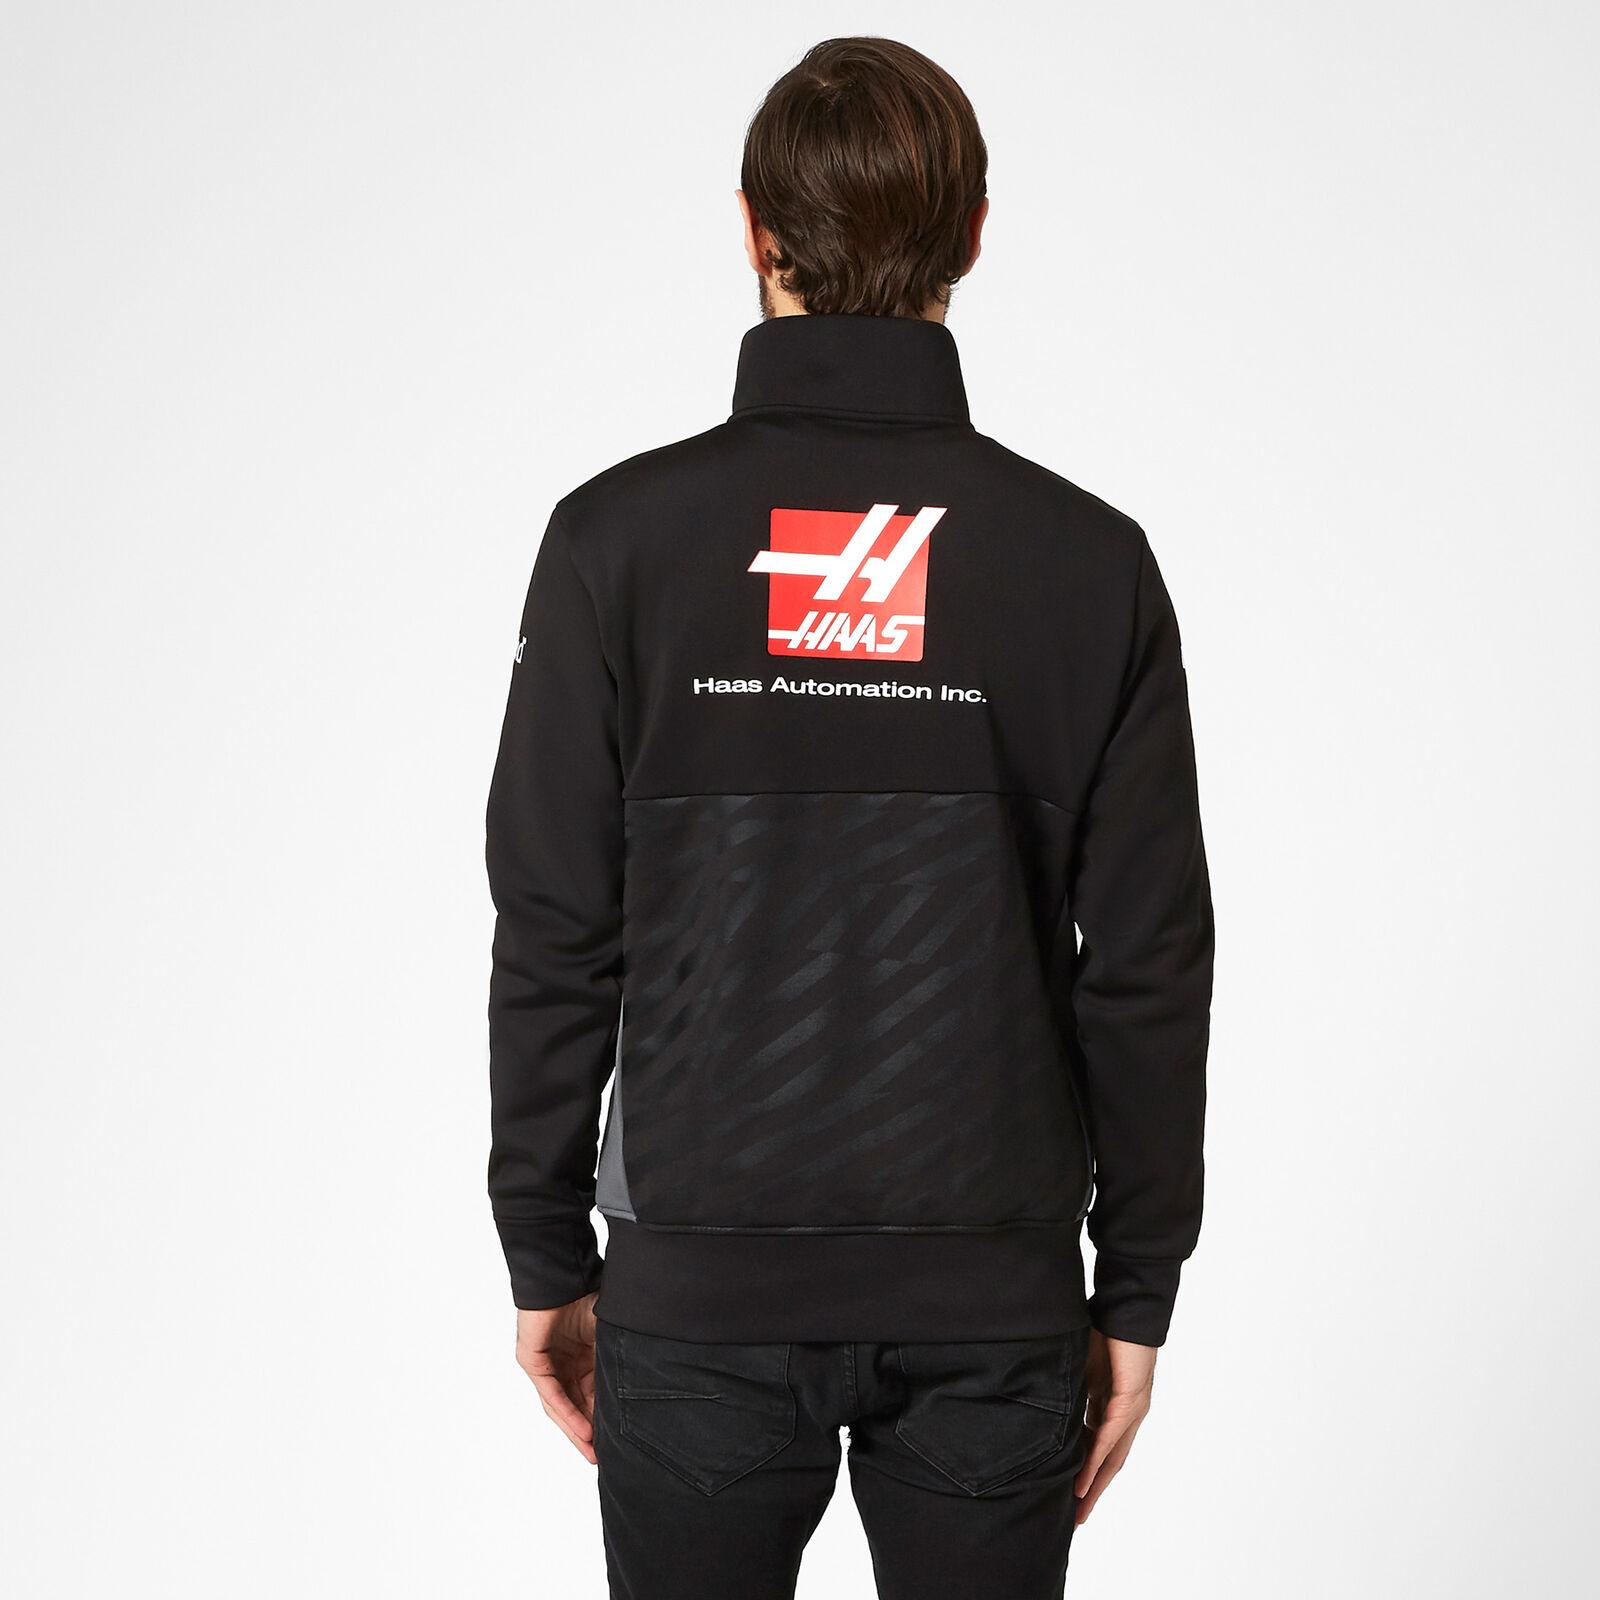 Fuel For Fans Unisex Formula 1 Haas F1 Team Pullstring Bag Black One Size